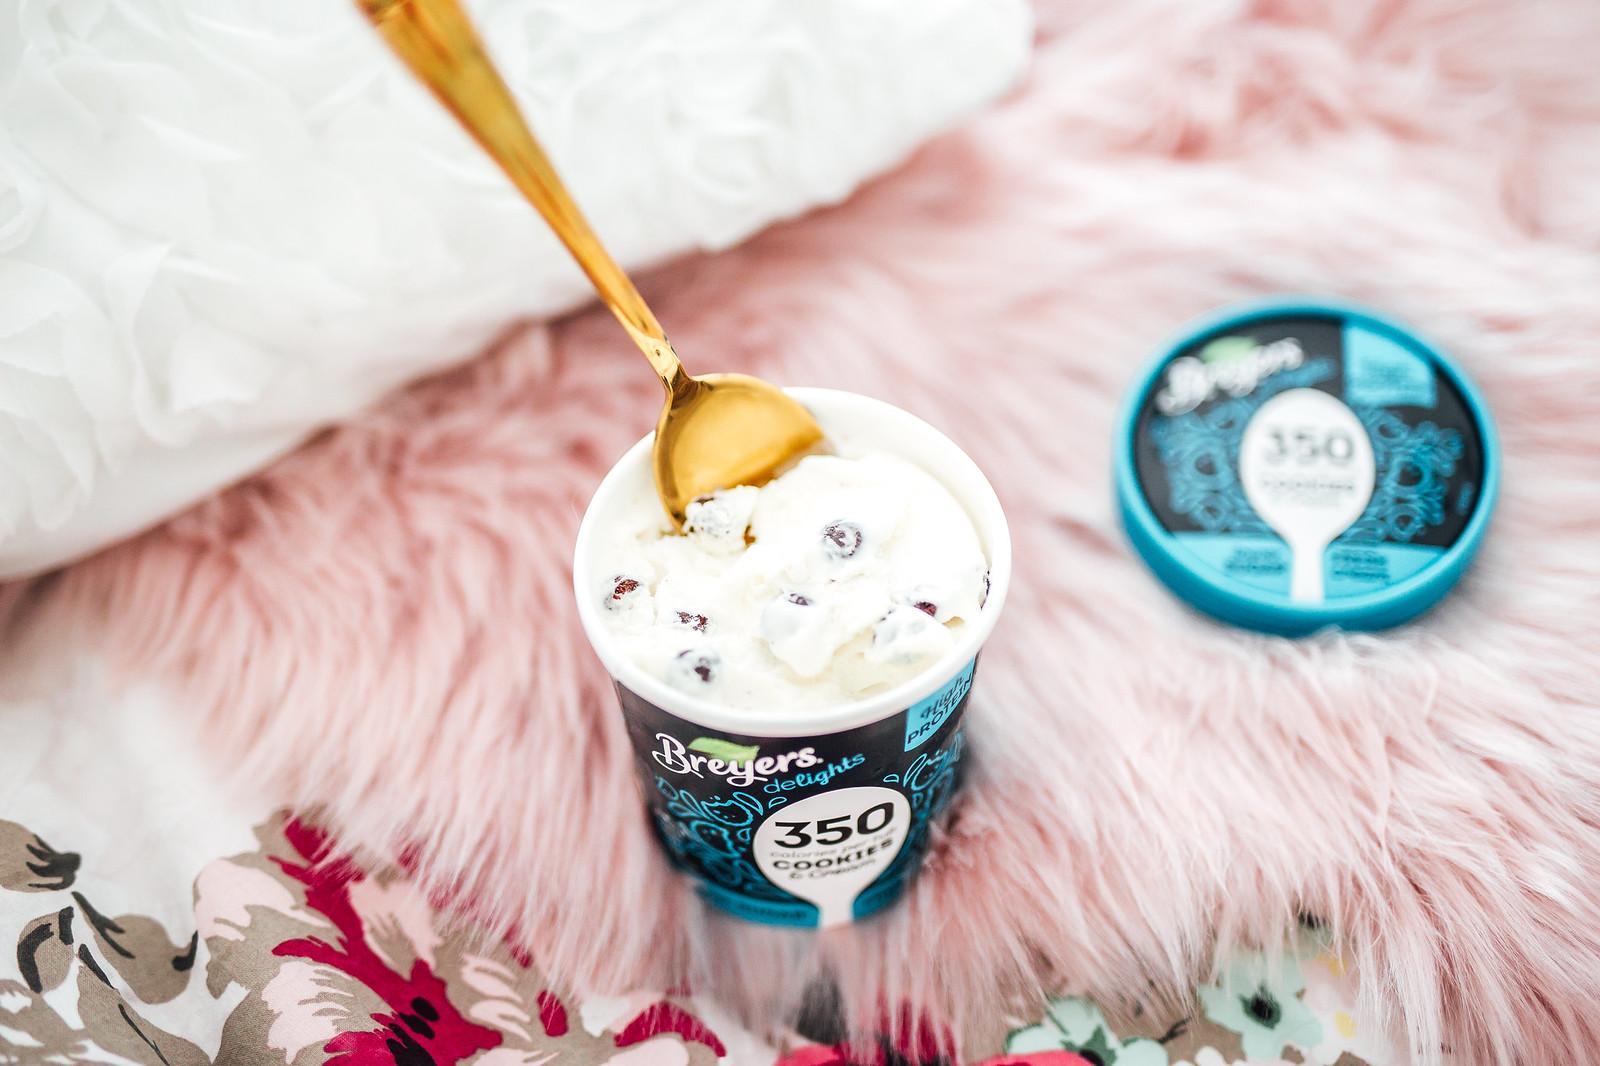 Breyers Delights cookie ice cream